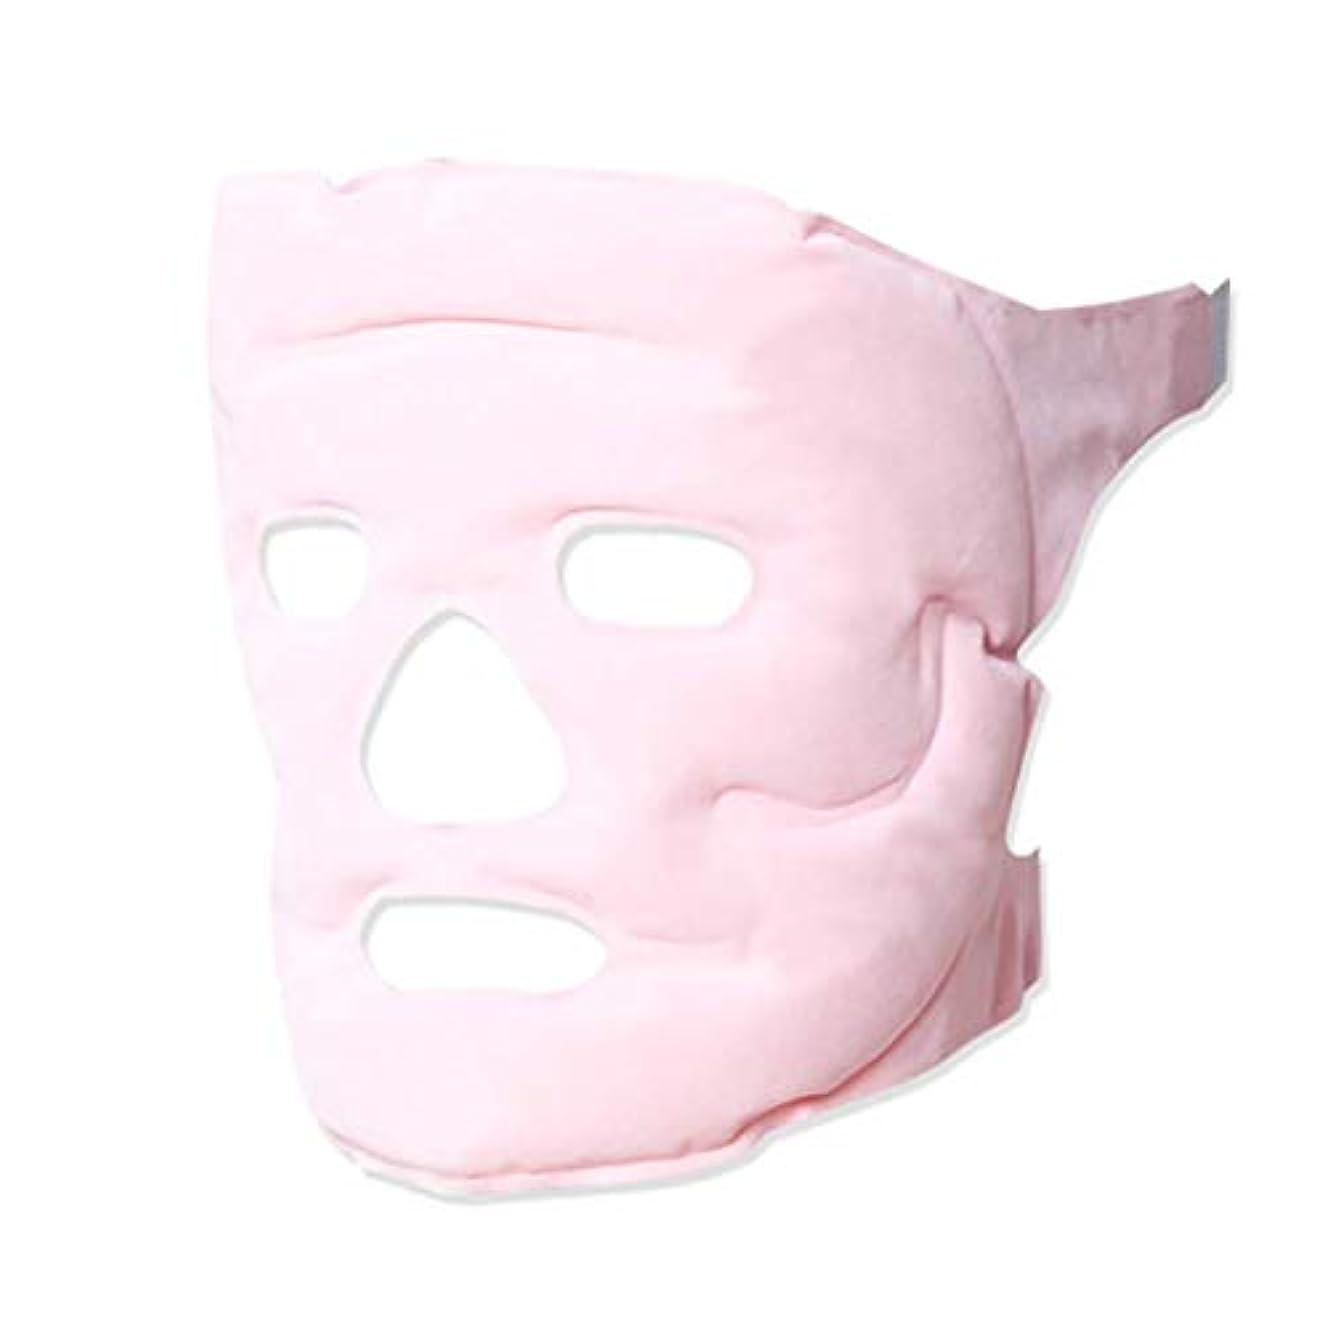 vフェイスマスク睡眠薄い顔で美容マスク磁気療法リフティングフェイシャル引き締め判決パターン包帯アーティファクトピンク